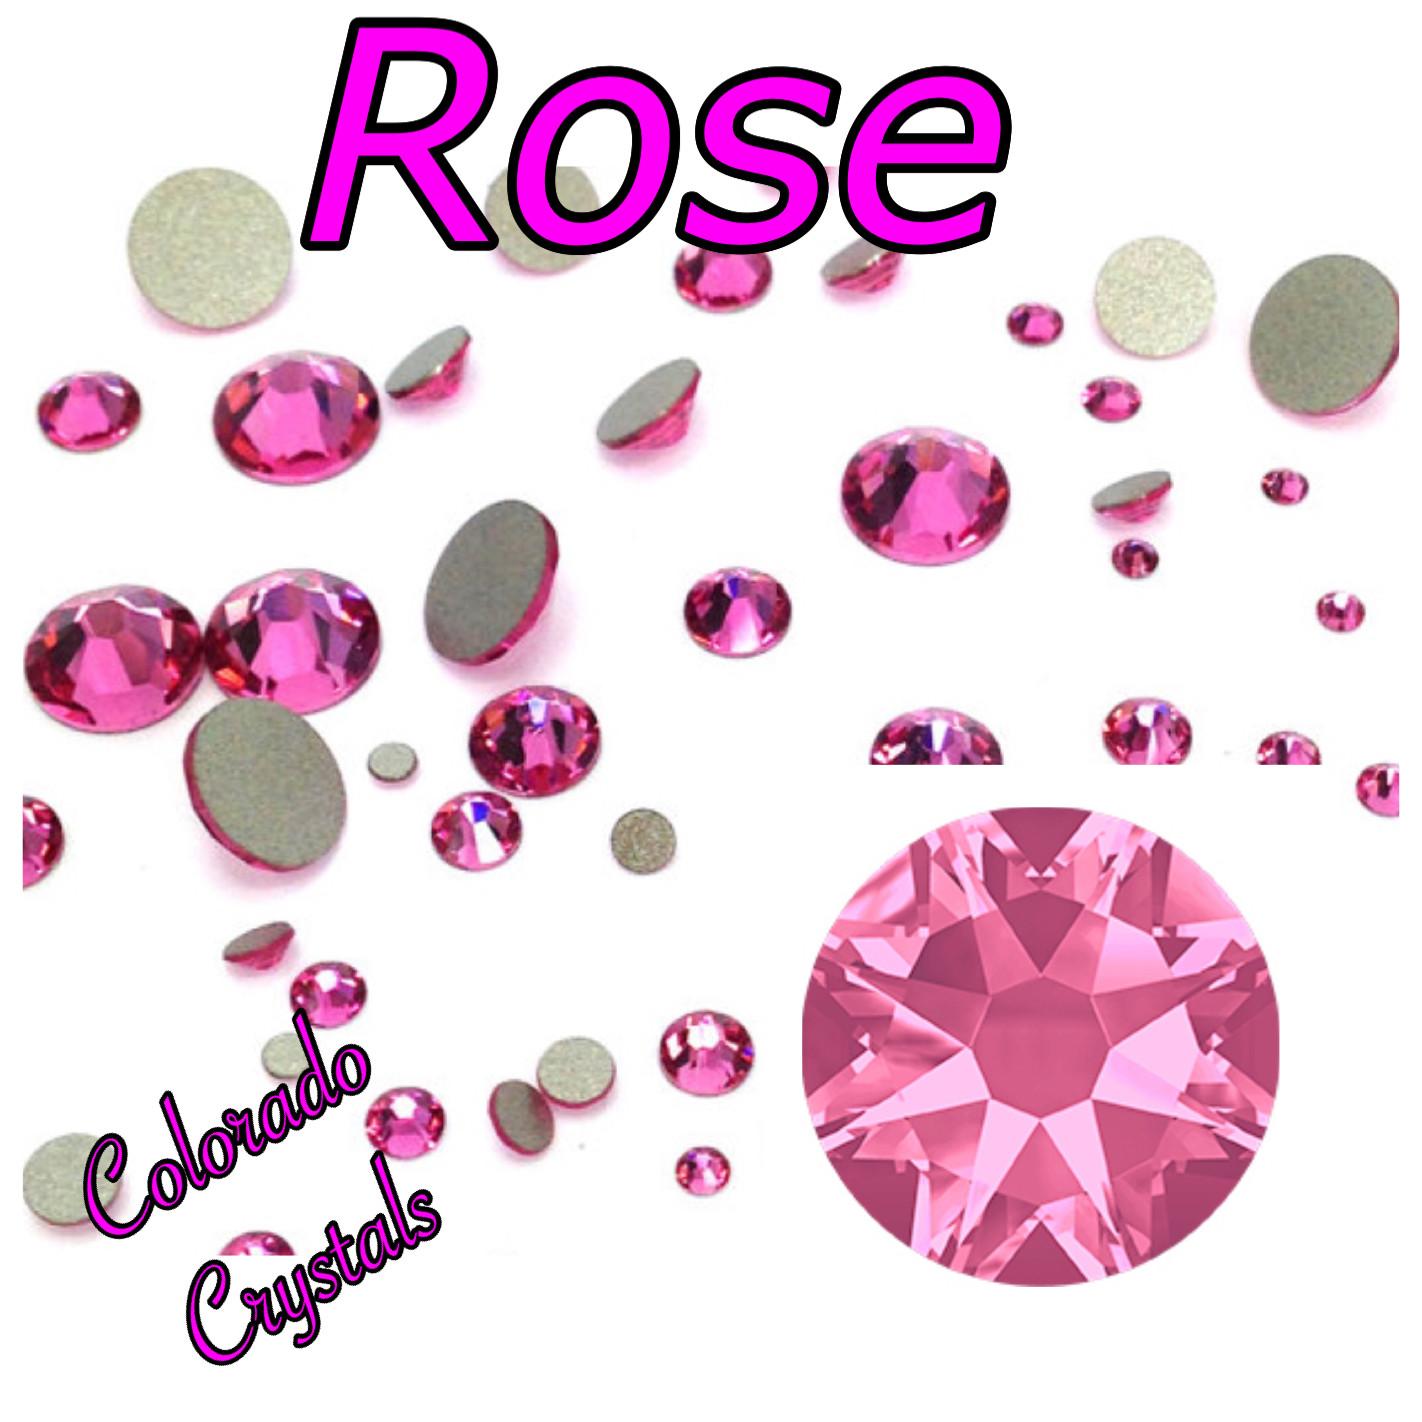 Rose 20ss 2088 Limited Swarovski Pink Crystals